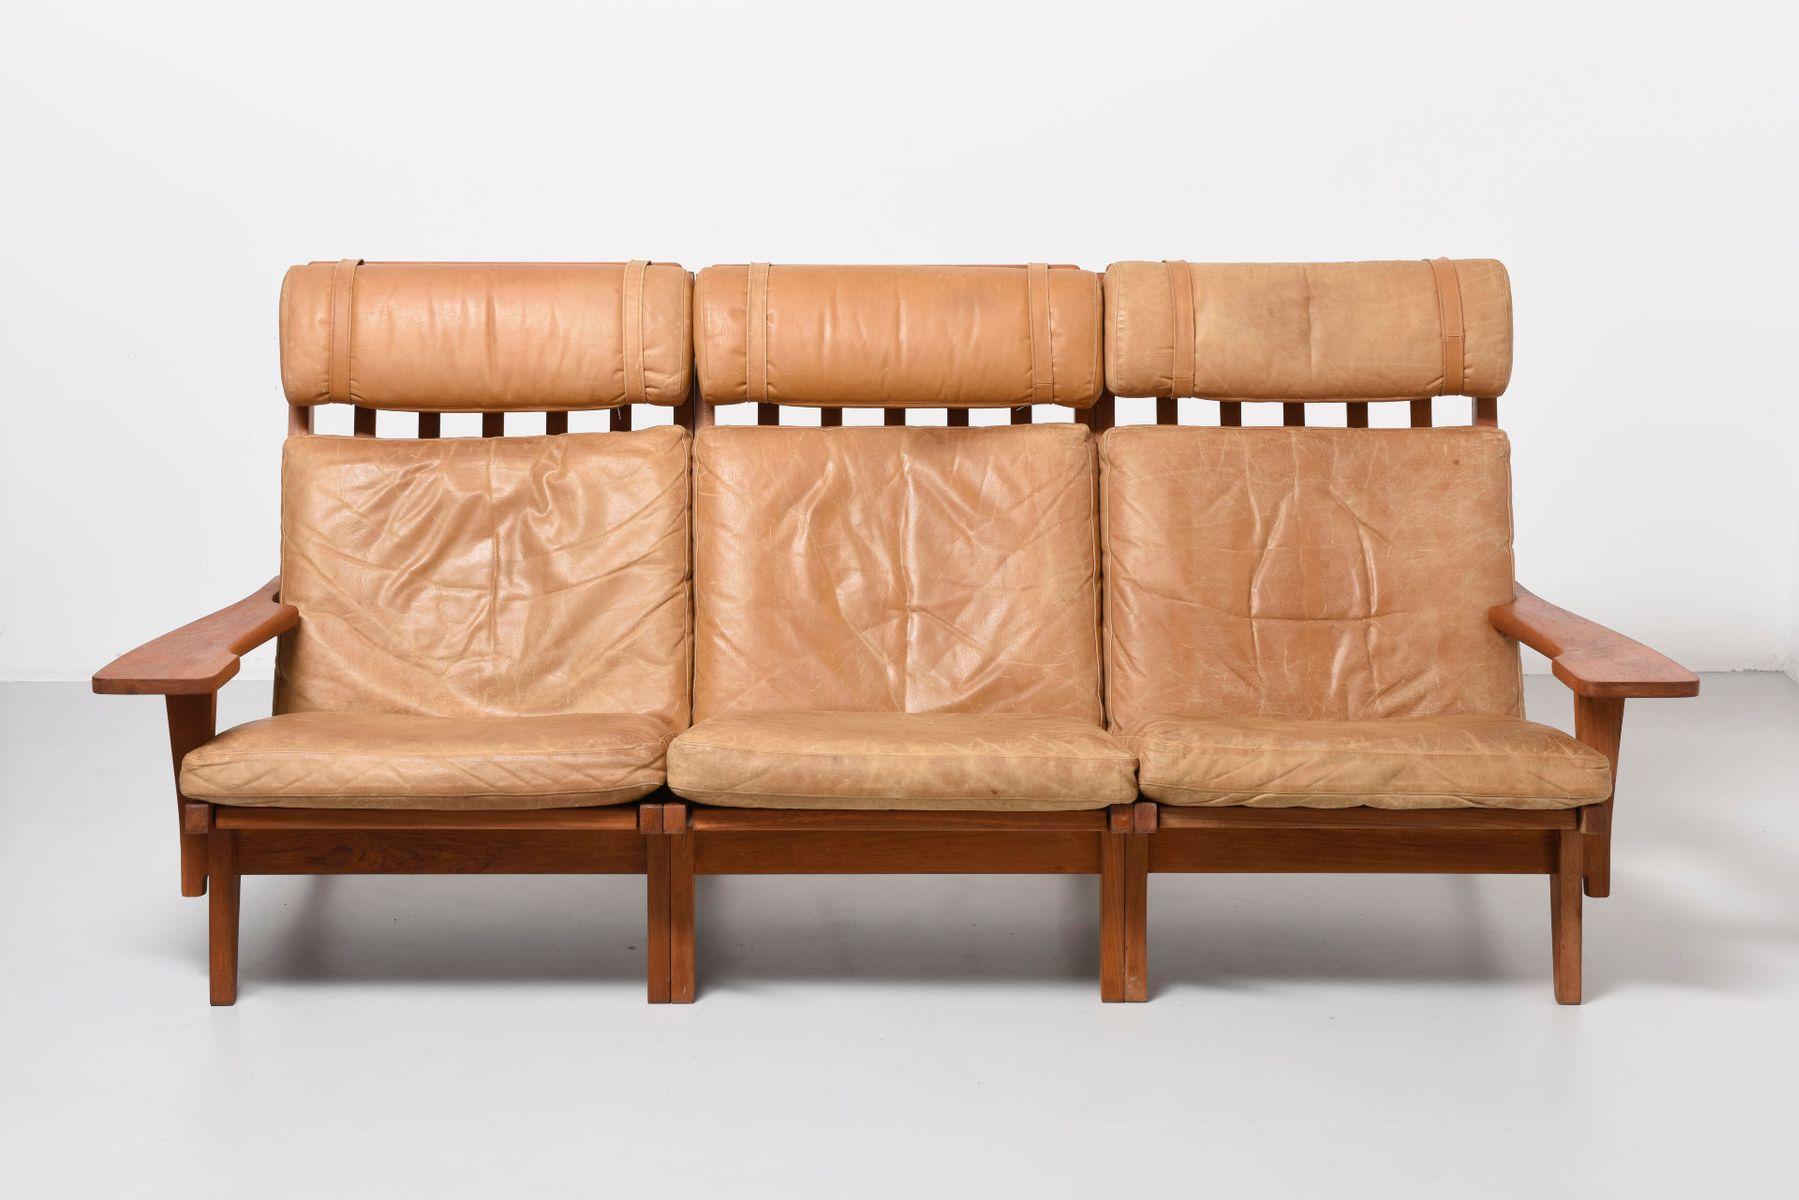 Mid Century GE 375 3 Three Seater Sofa by Hans J Wegner for